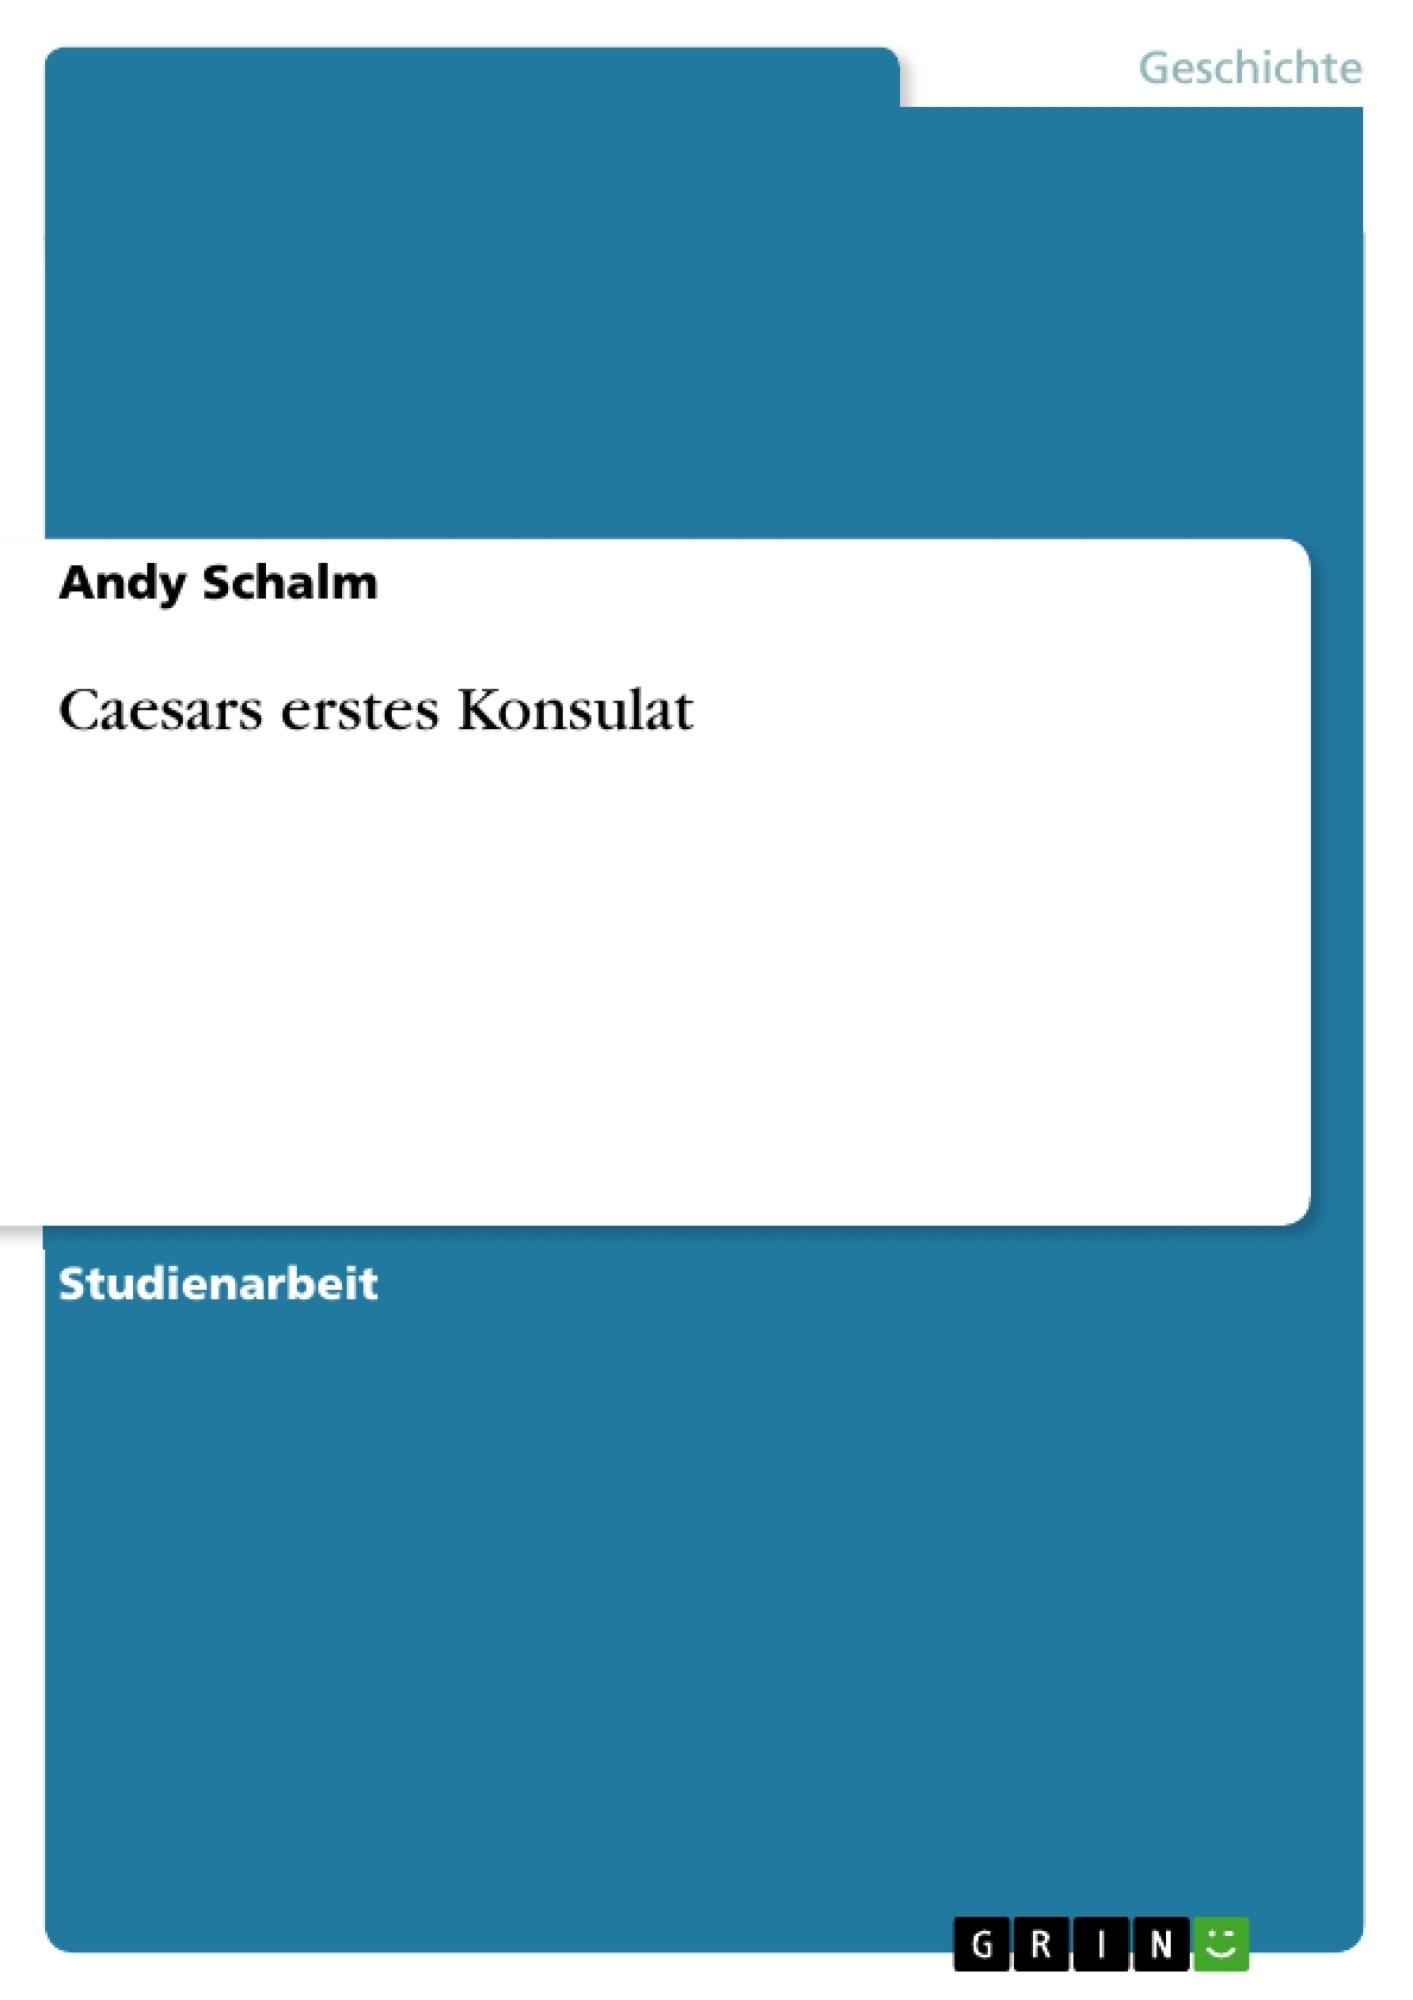 Titel: Caesars erstes Konsulat